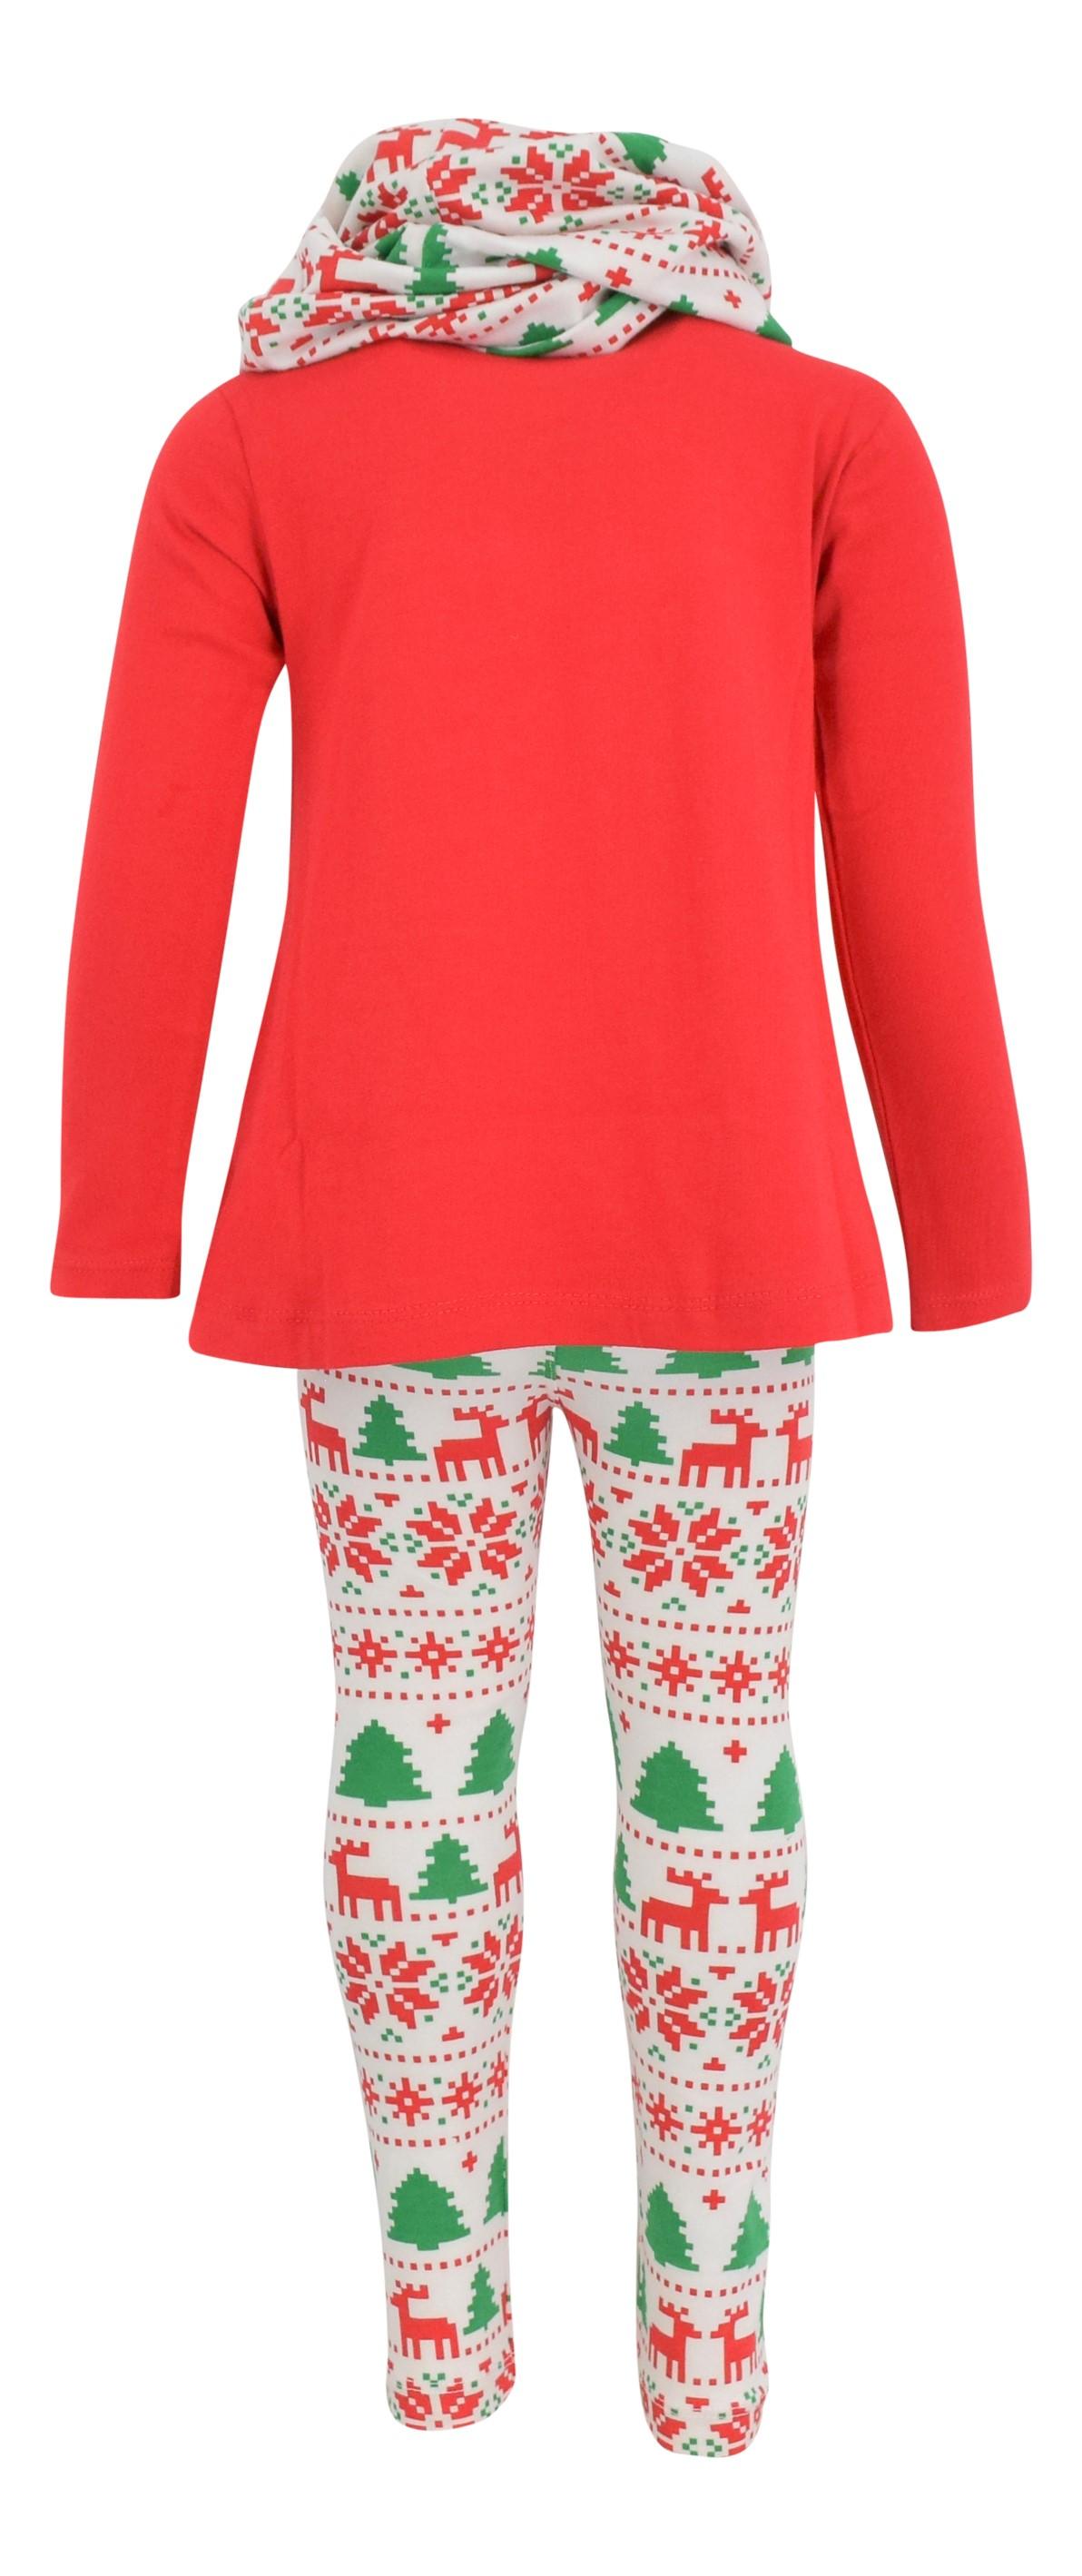 Girls Boutique 3 Piece Red Christmas Winter Legging Set ...